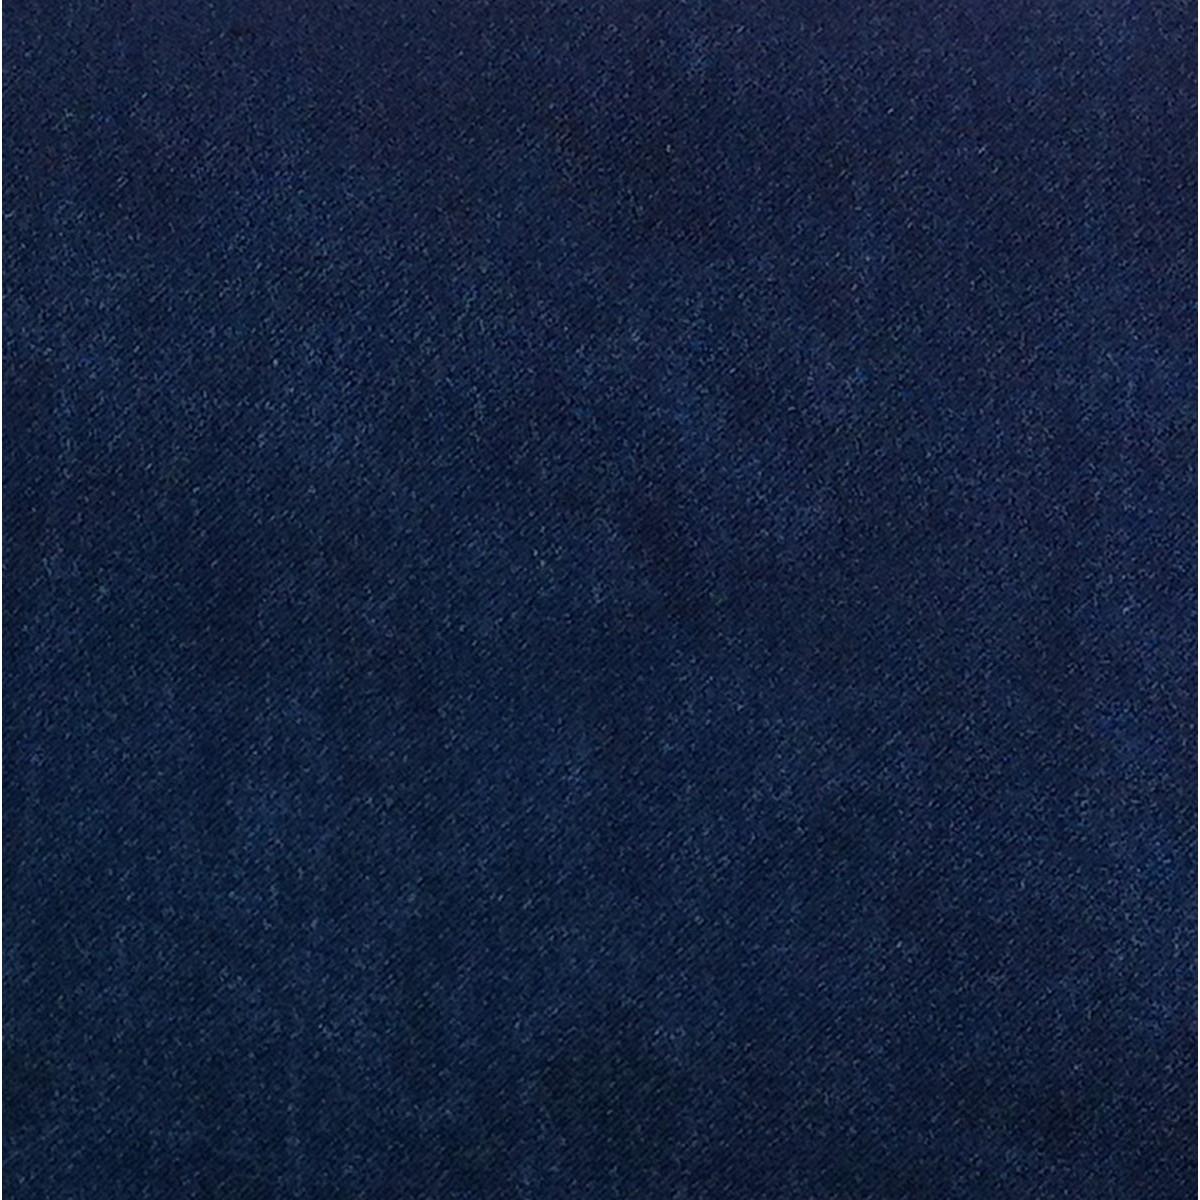 couleur bleu marine mademoiselle rose chaussures de. Black Bedroom Furniture Sets. Home Design Ideas